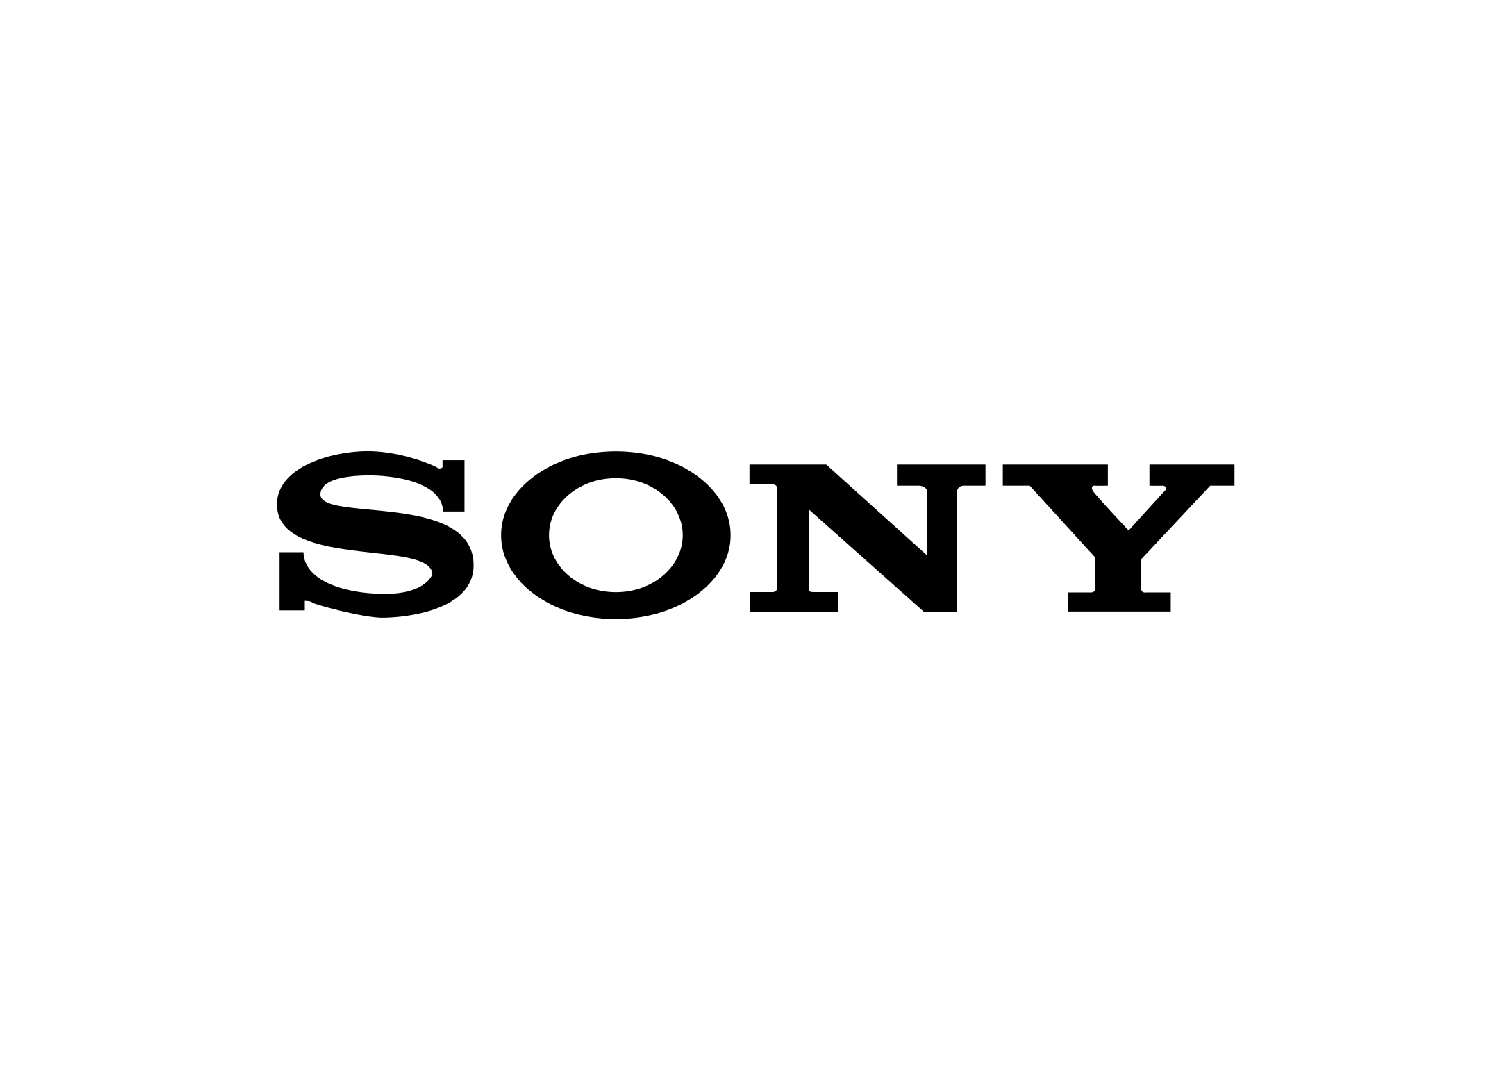 Sony-01.jpg